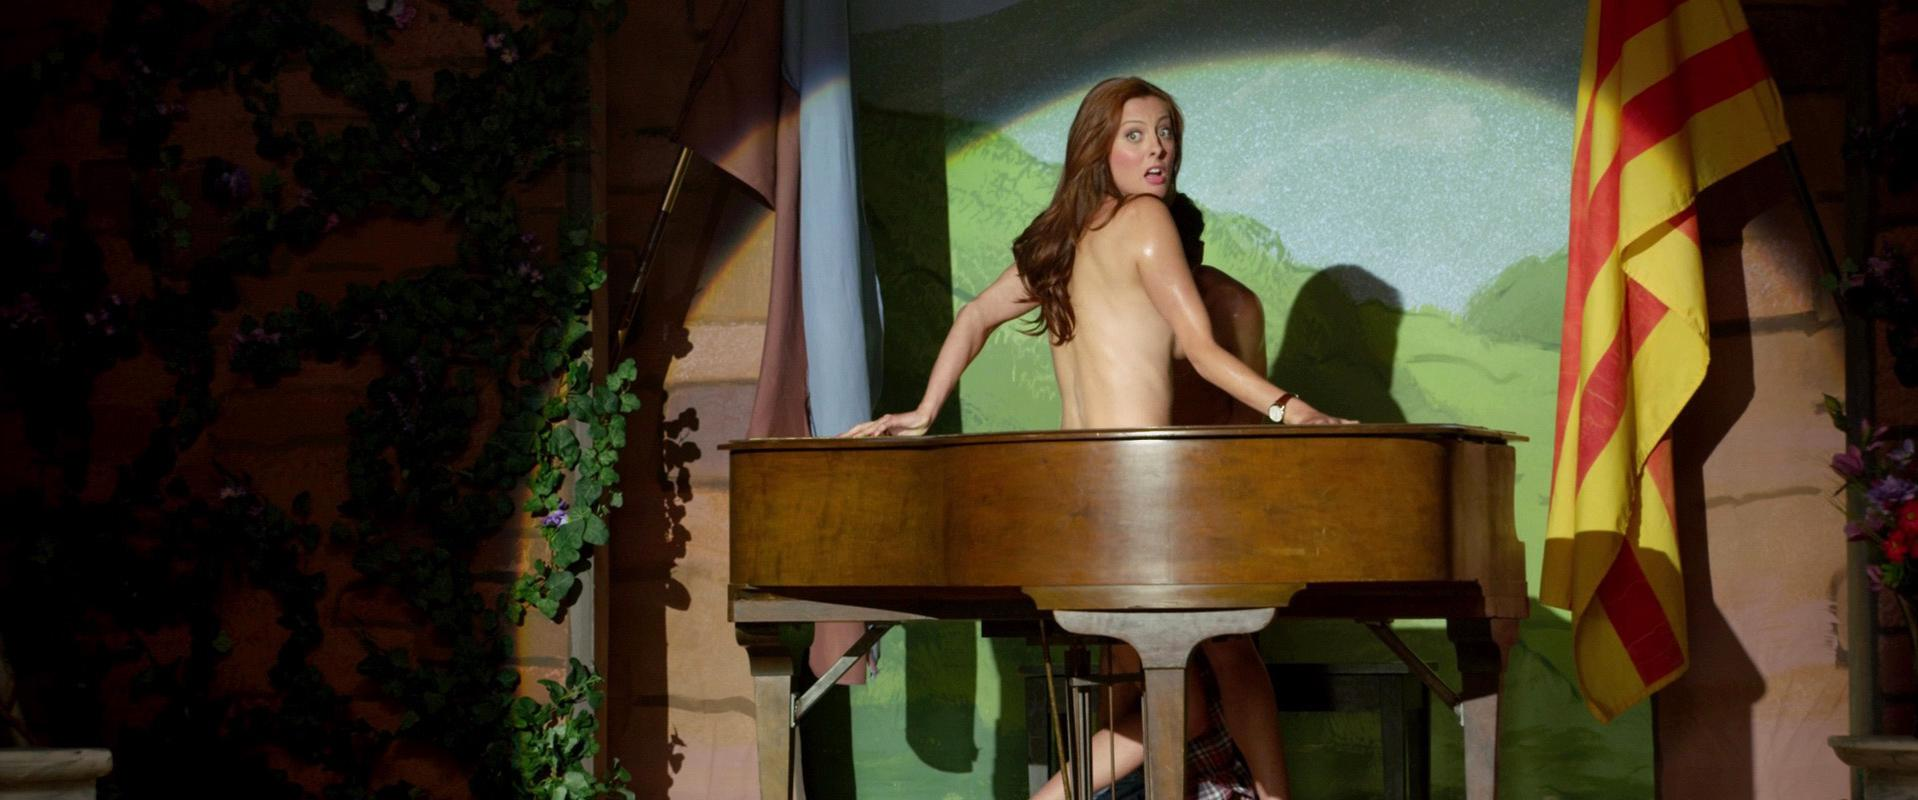 Bbw hairy mature nude